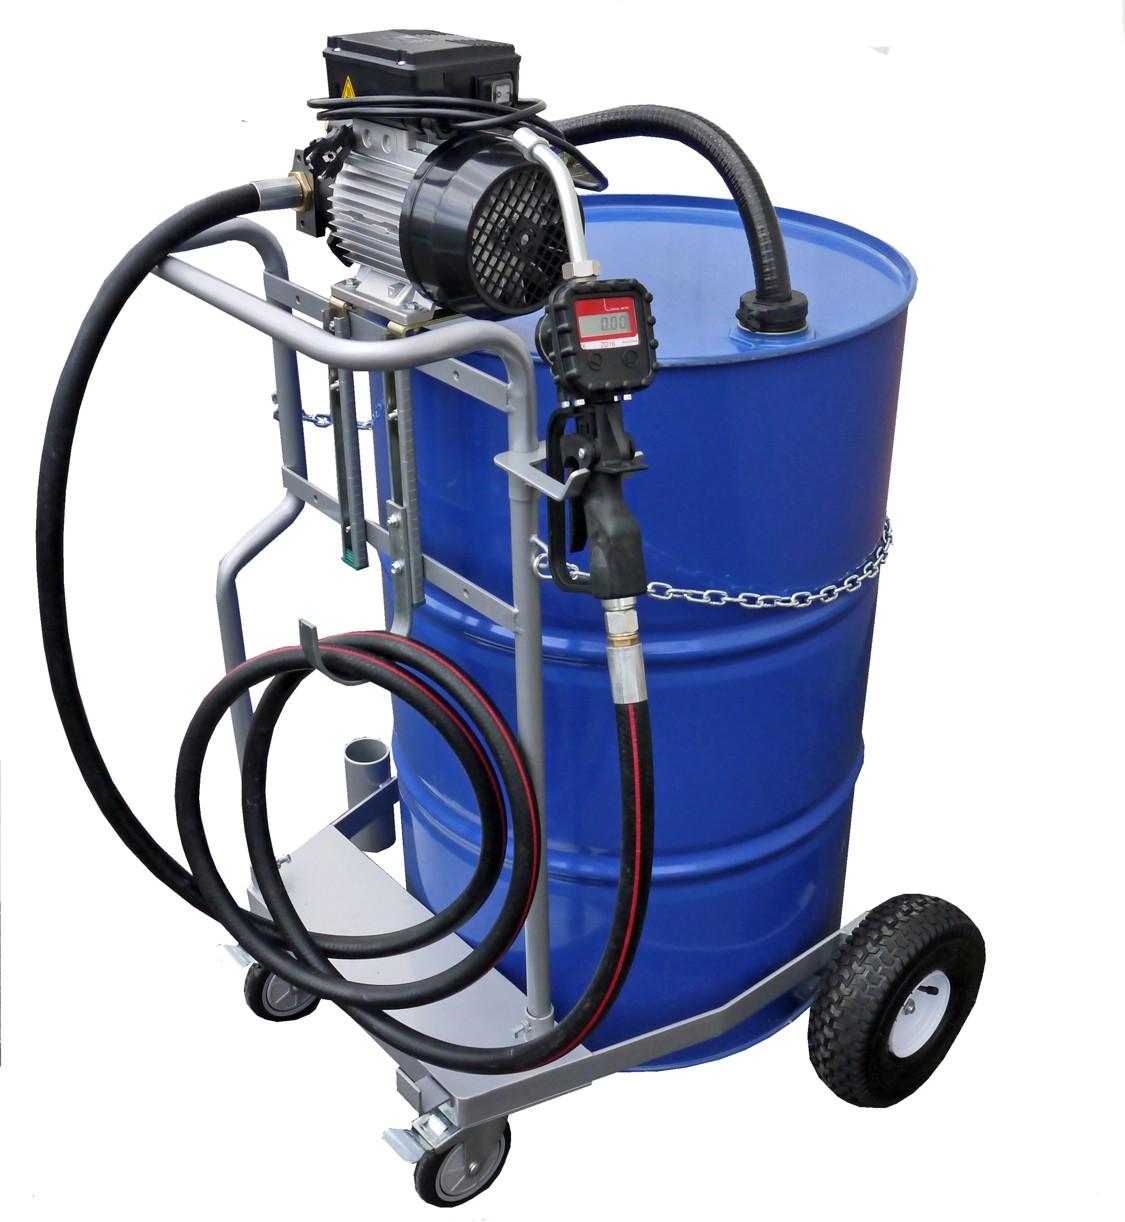 fahrwagen f r 200 liter fass 230v elektropumpe piusi viscomat 70 4m schlauch. Black Bedroom Furniture Sets. Home Design Ideas